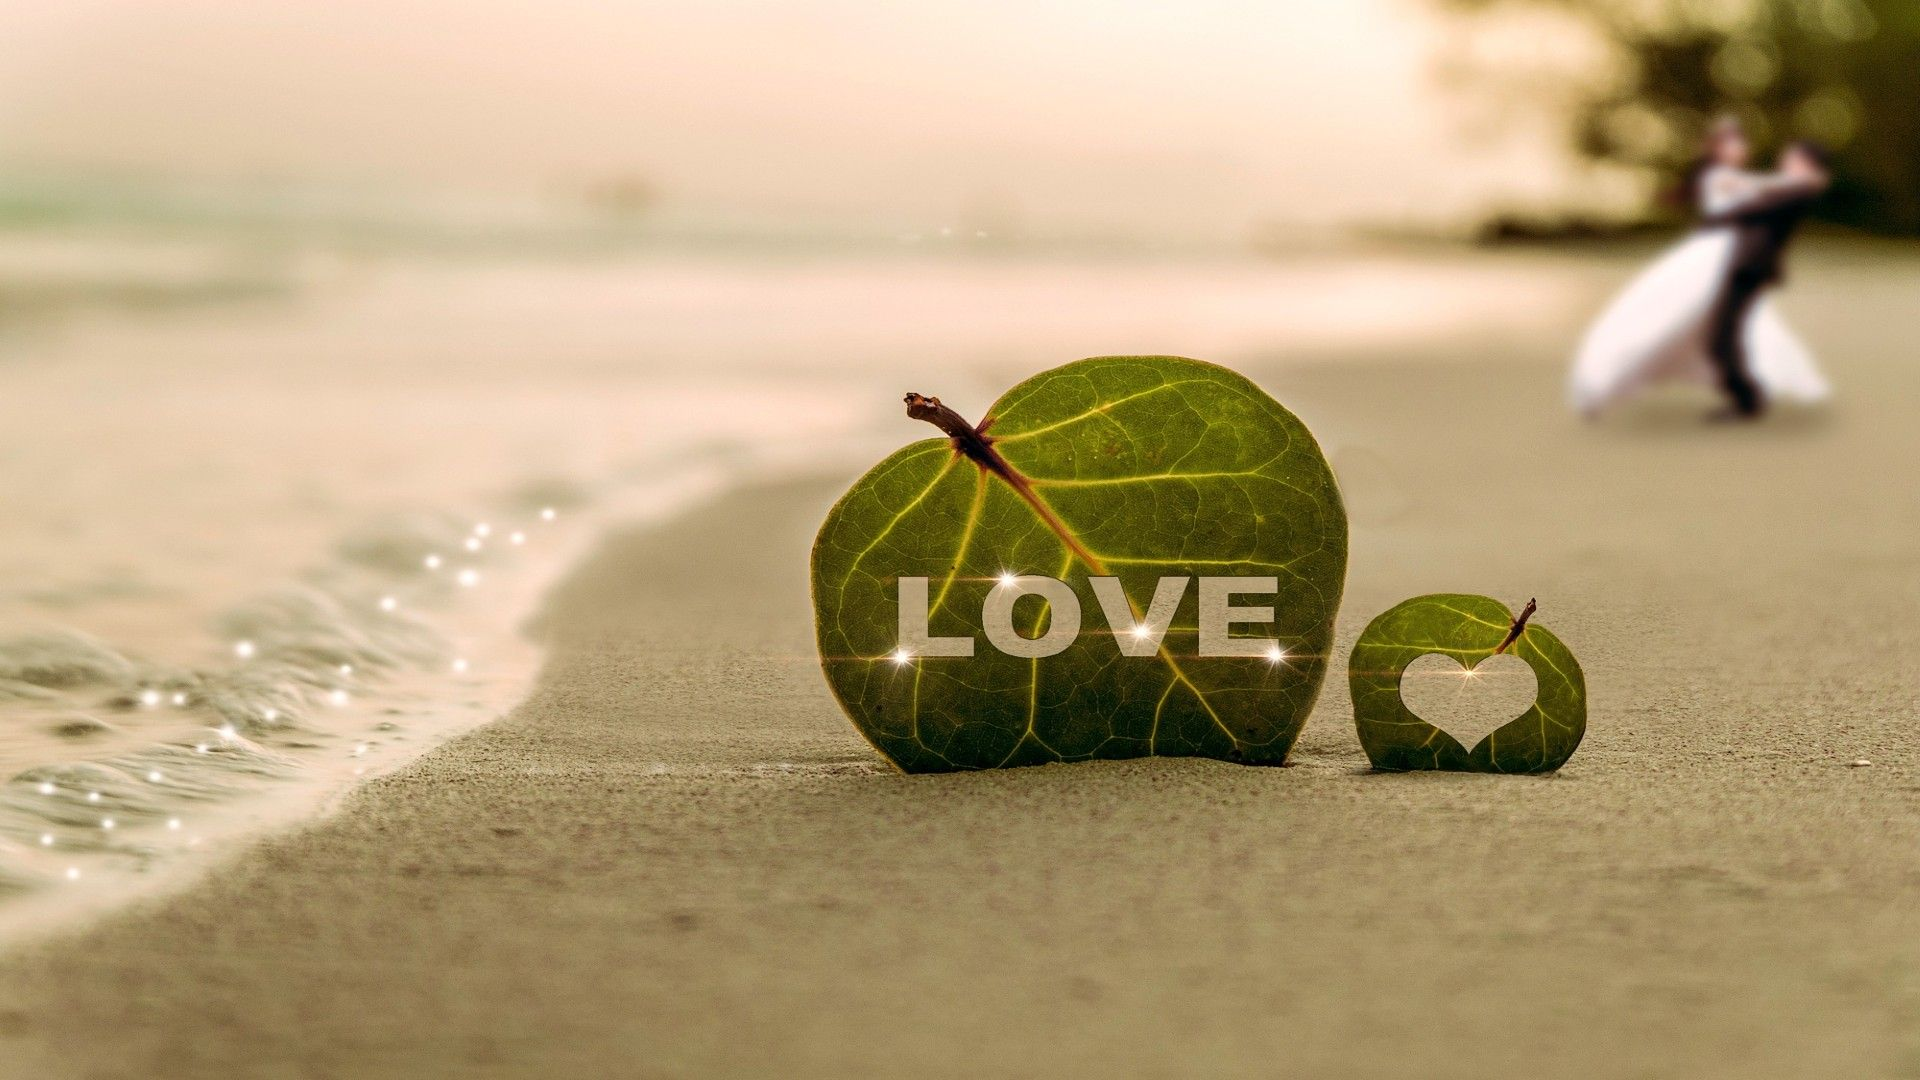 Hd wallpaper love couple - Top Beautiful Cute Romantic Love Couple Hd Wallpaper